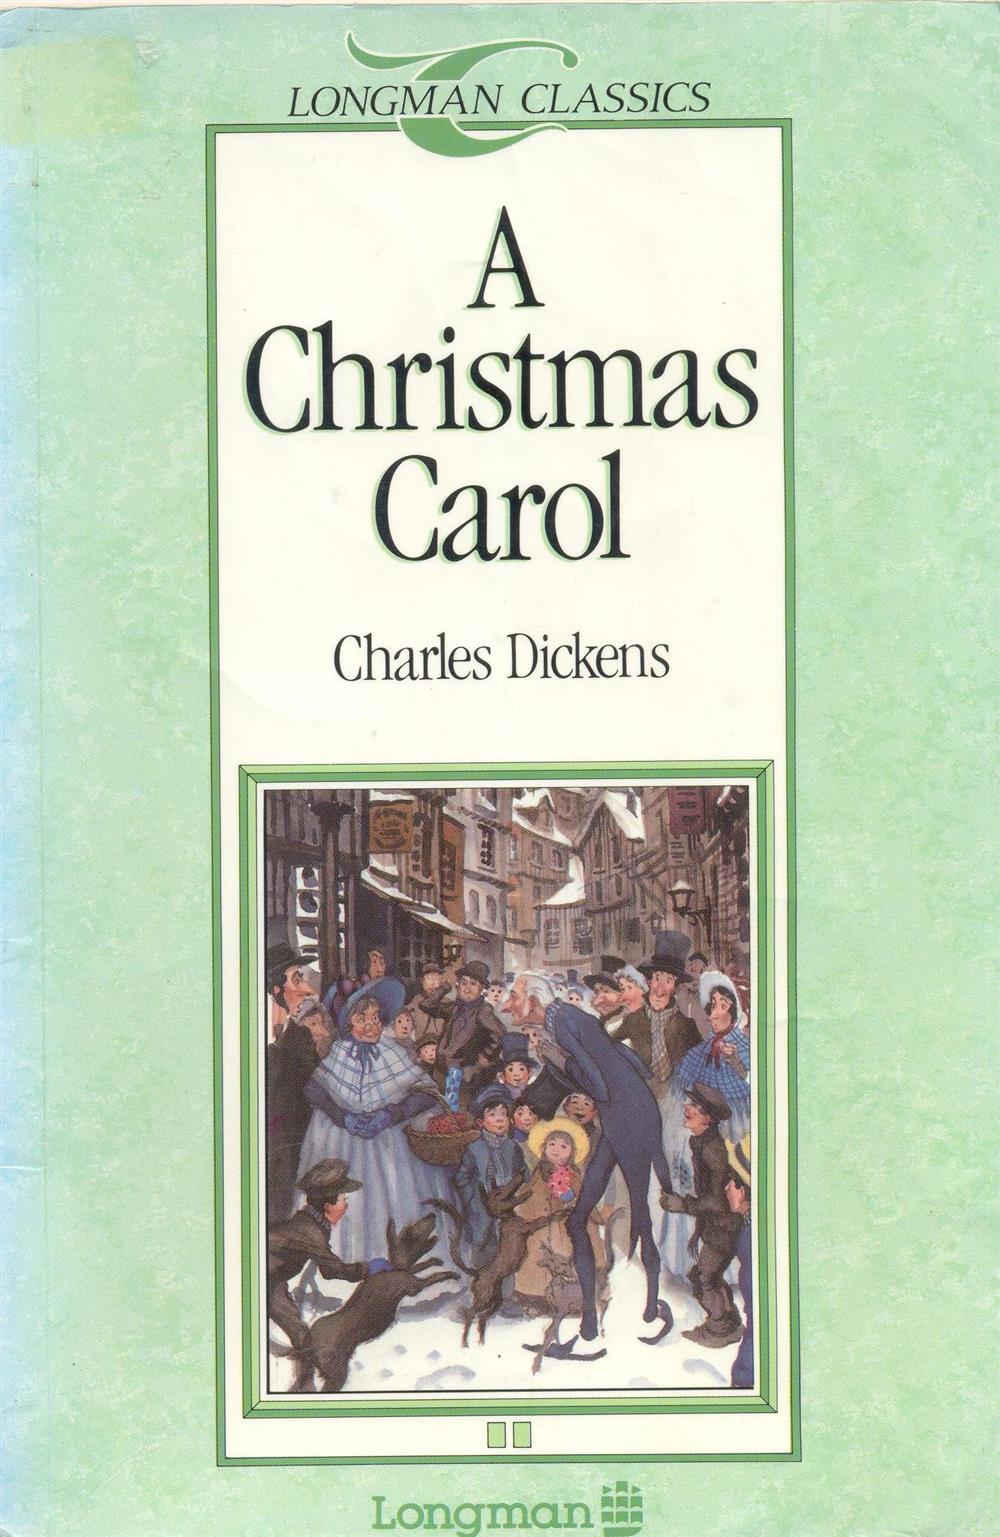 a christmas Carol 001.jpg